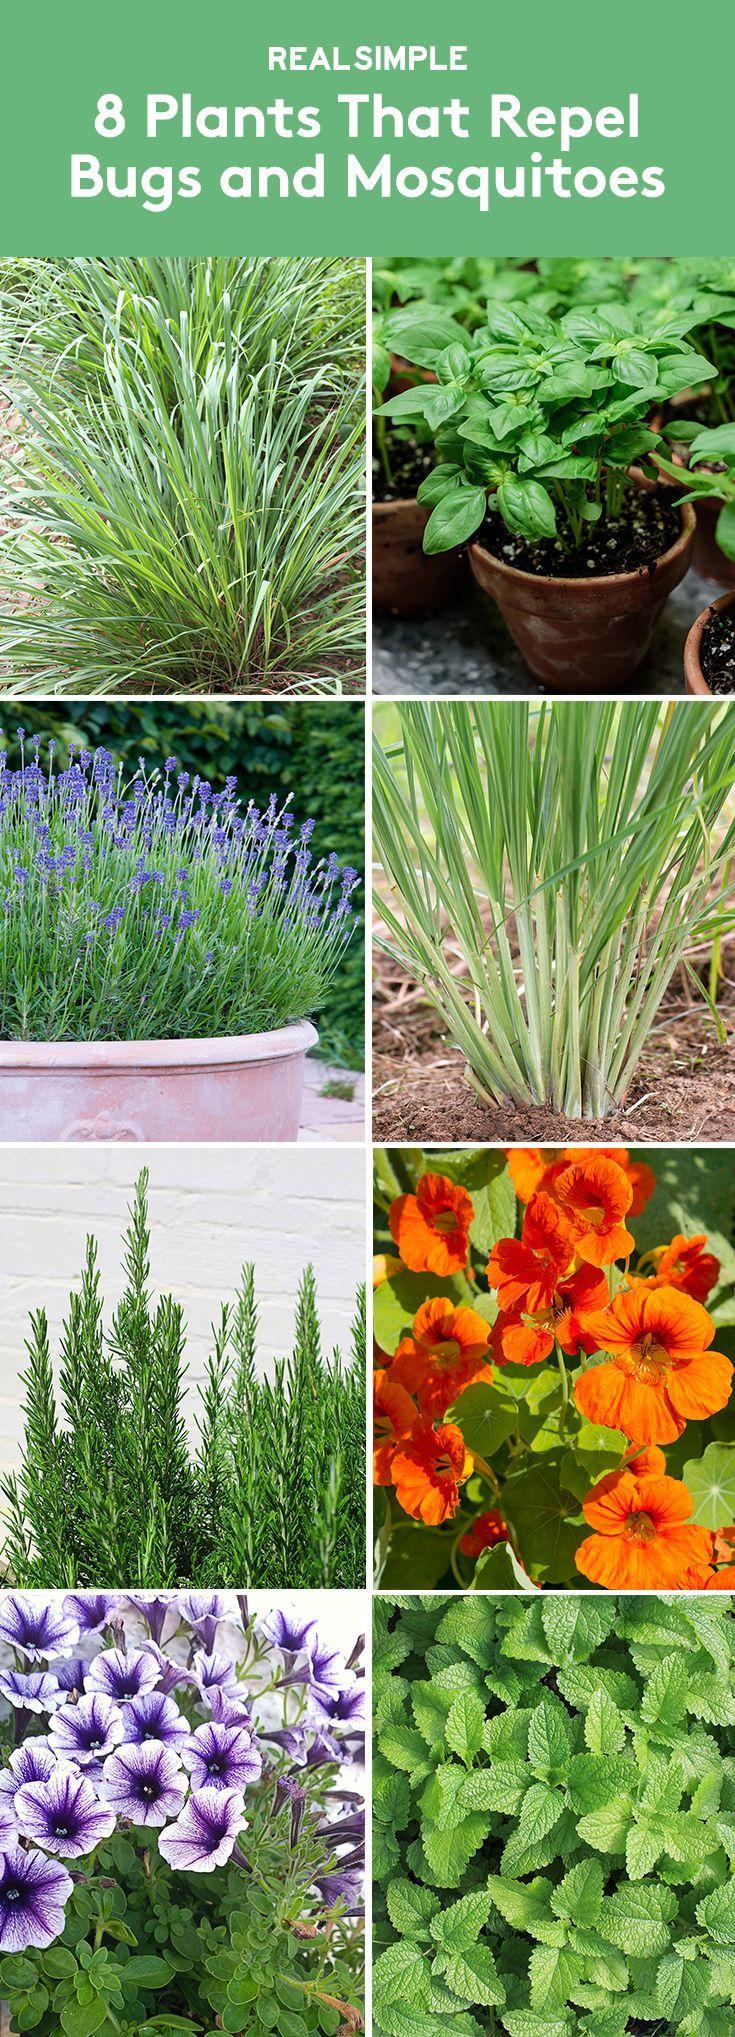 How to Grow a Pest Repellent Herb Garden How to Grow a Pest Repellent Herb Garden new foto